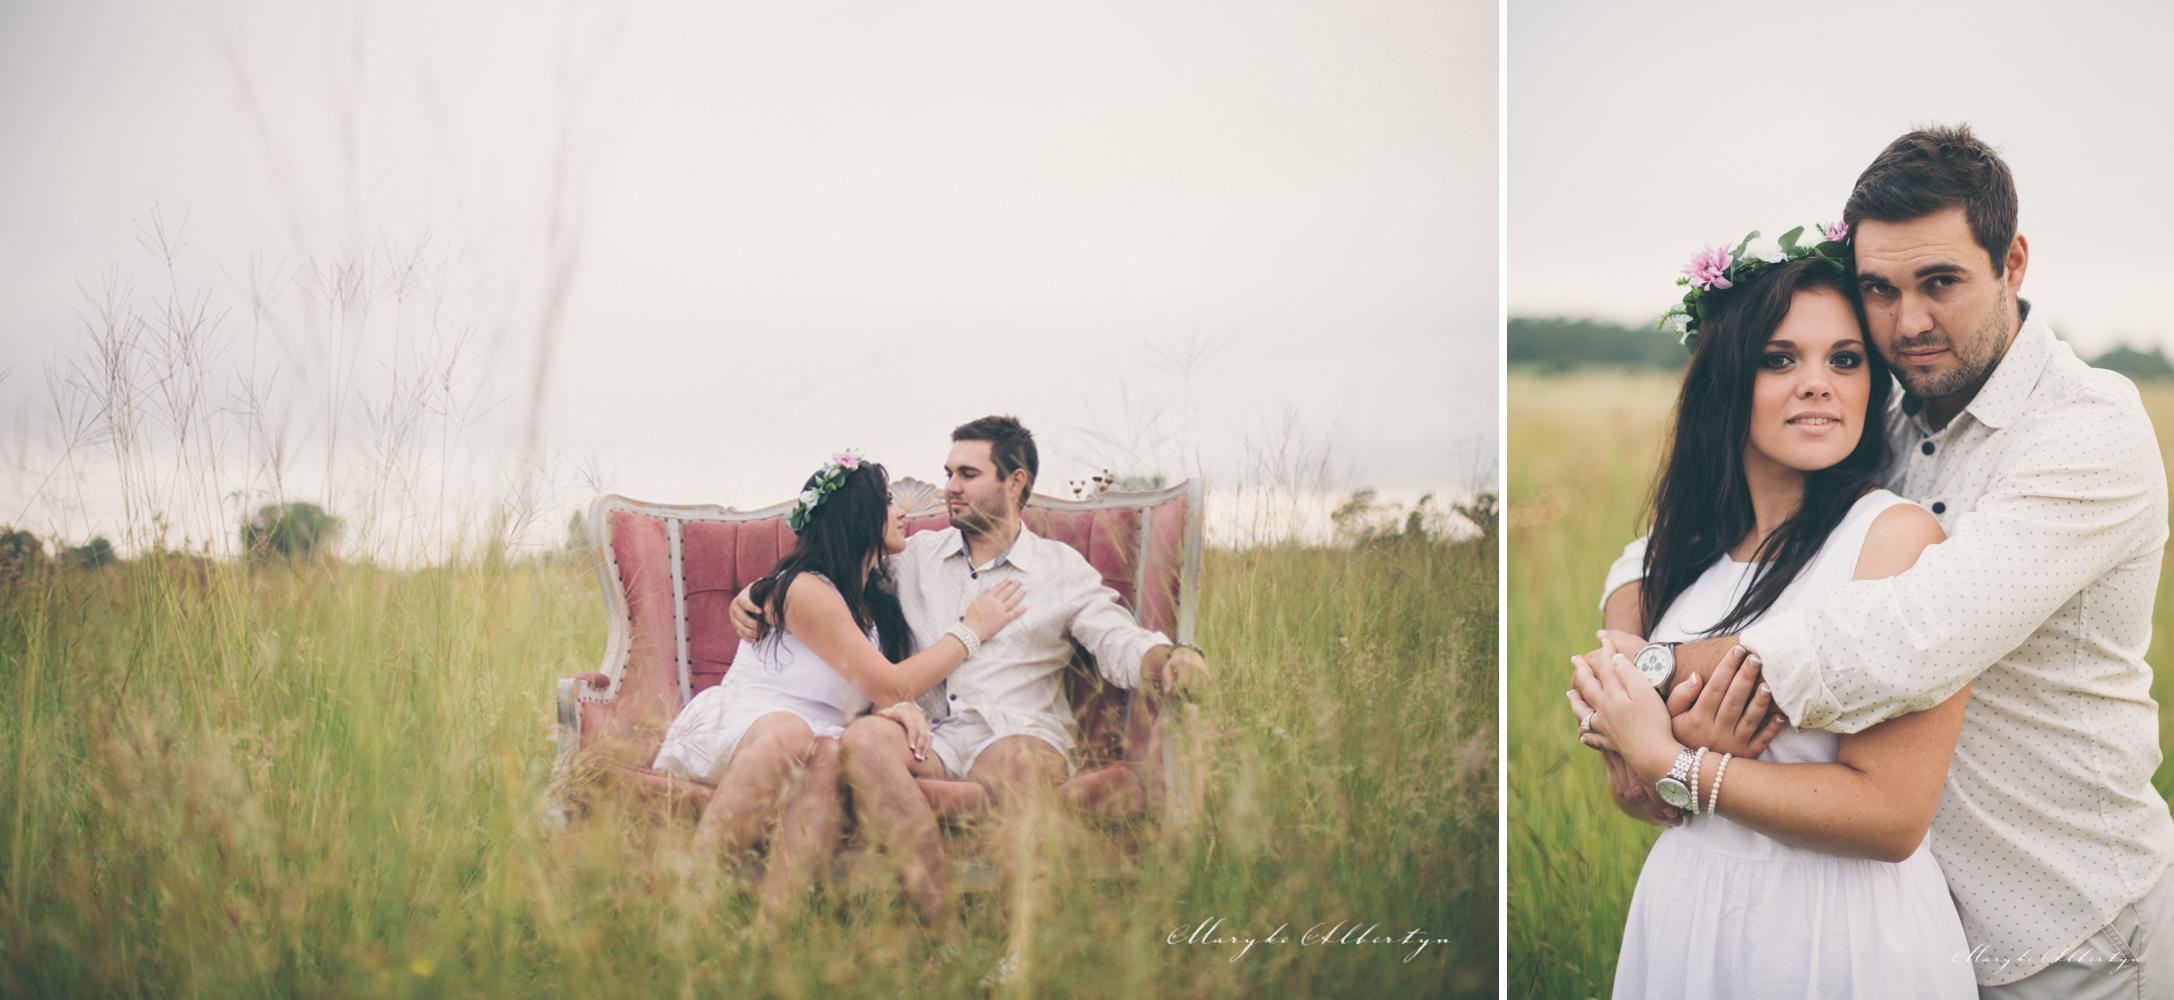 Bianca&Shaun_Engagement_ (7 of 34)